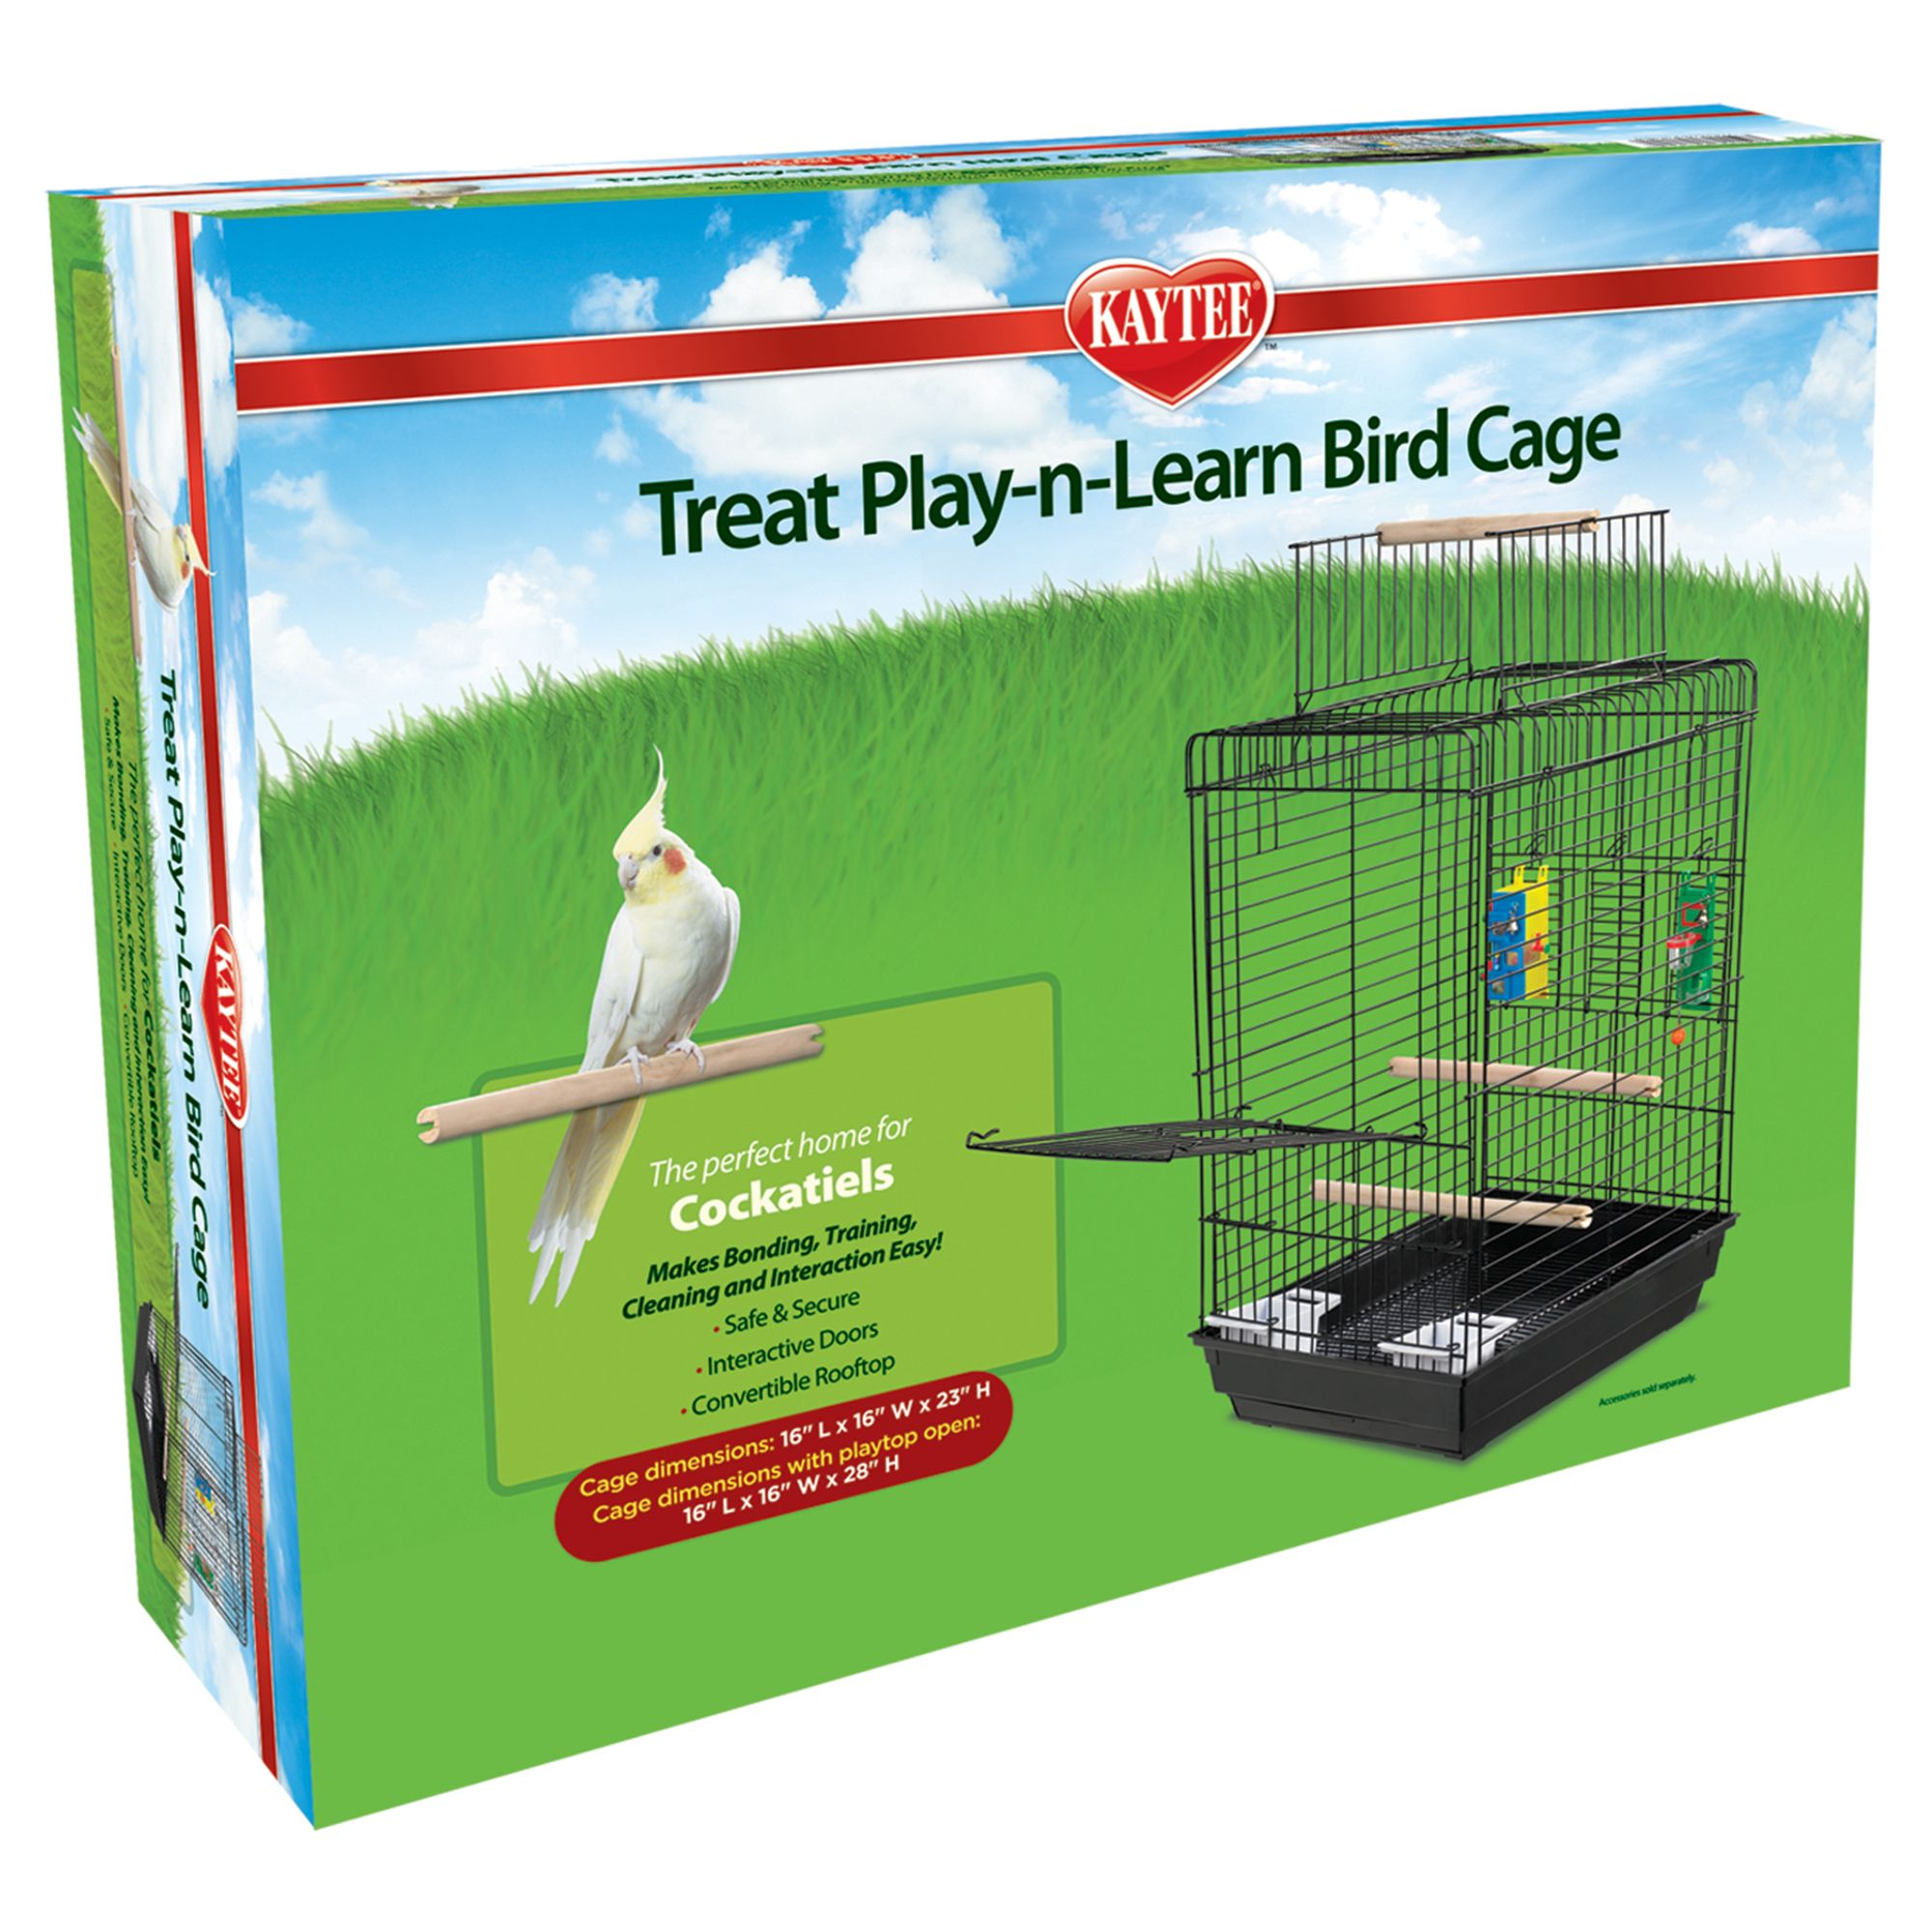 Kaytee Treat Play-N-Learn Cockatiel Cage, Super Pet 5180250